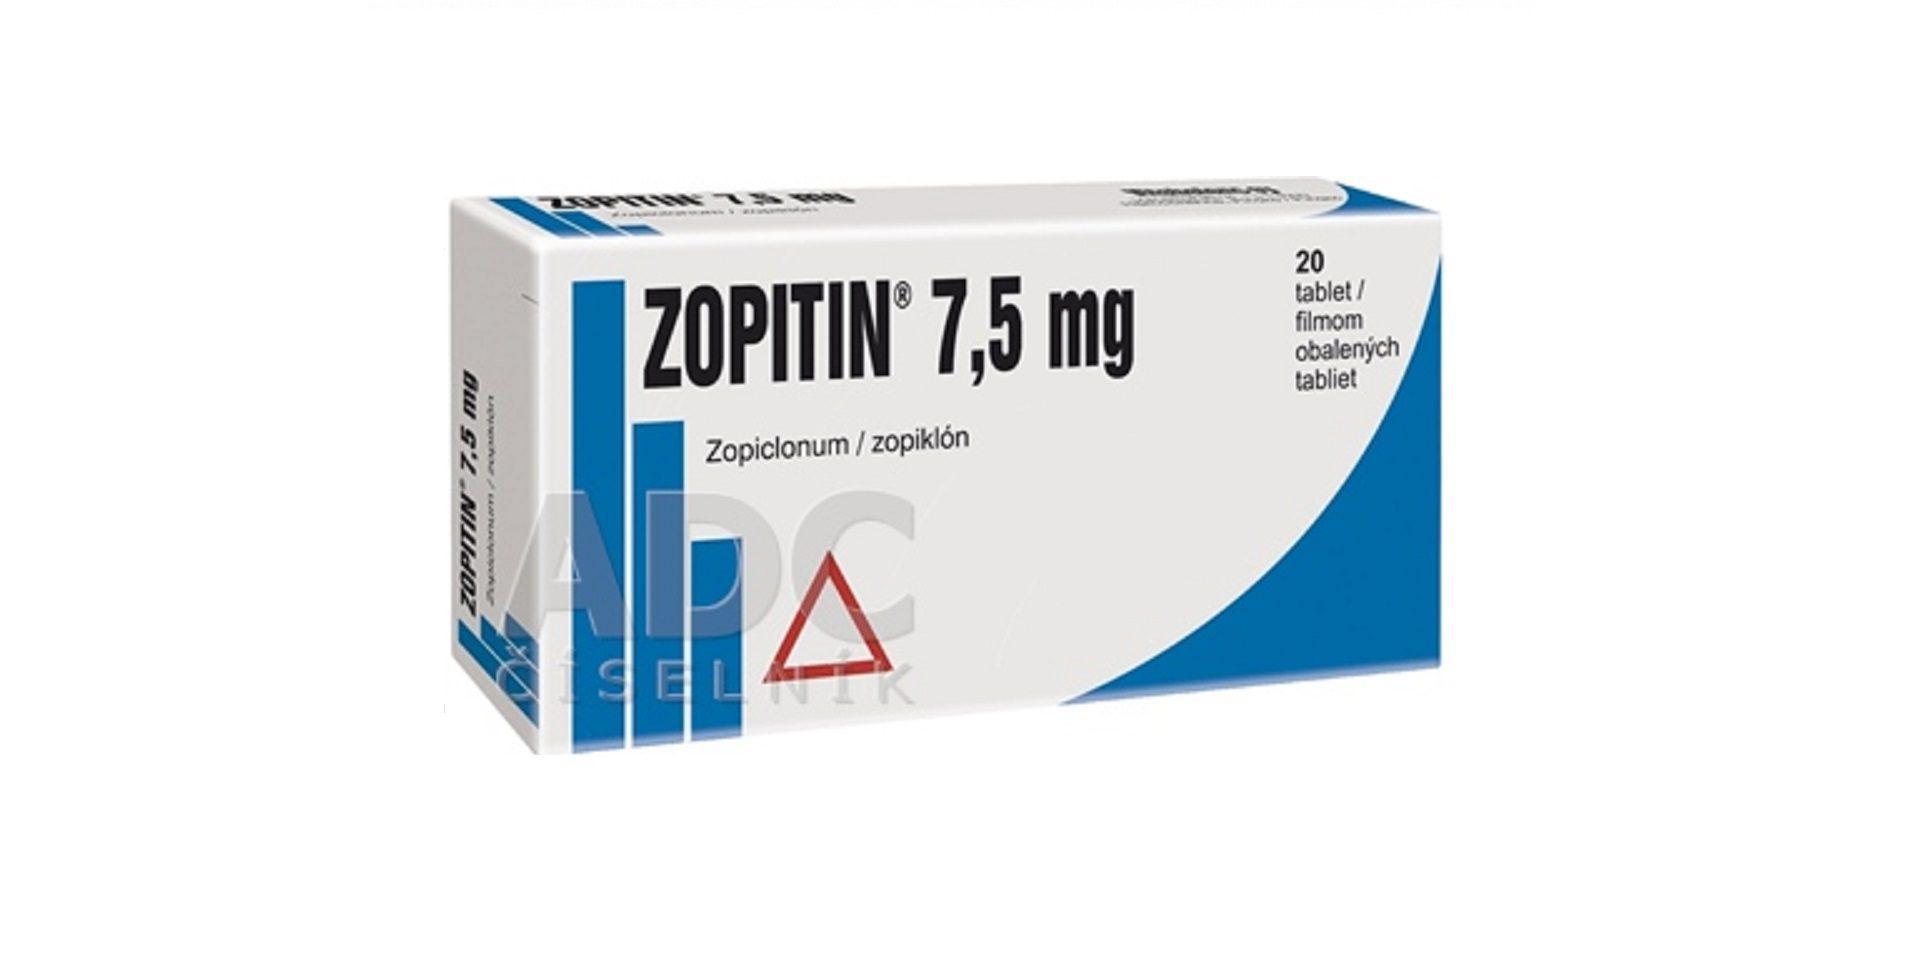 zopitin 7,5mg